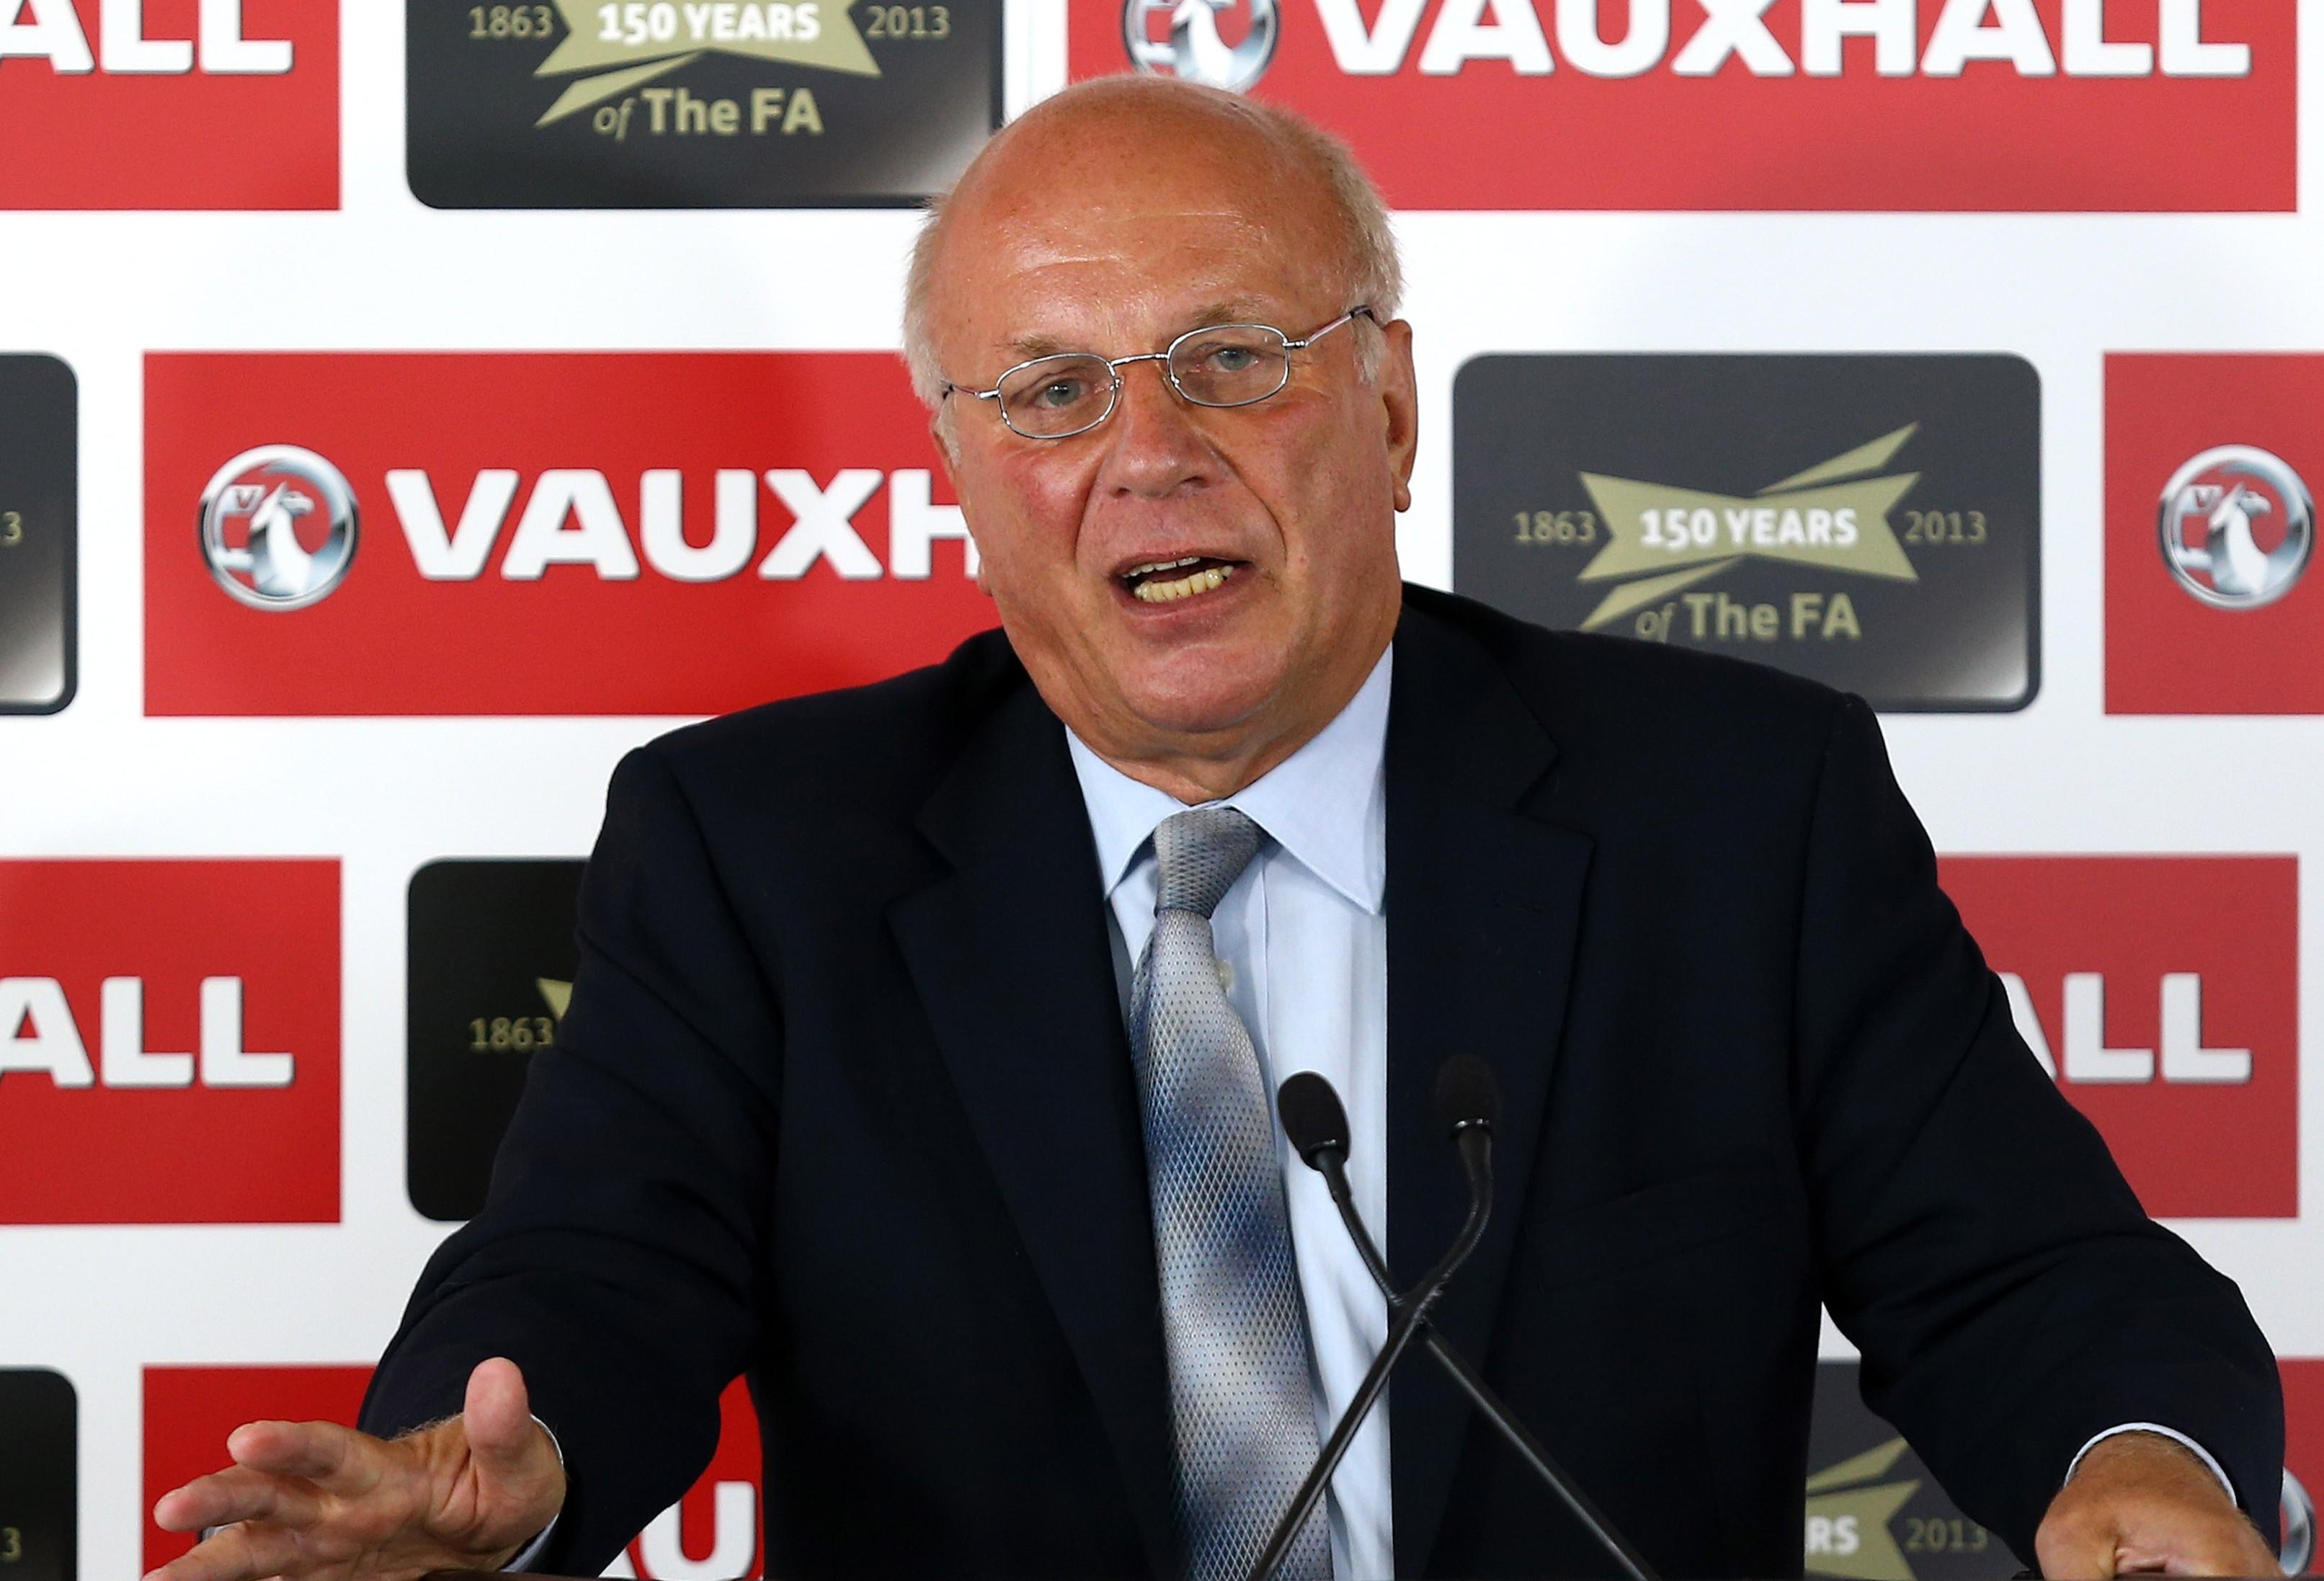 England must target 2022 World Cup win, insists FA chairman Greg Dyke